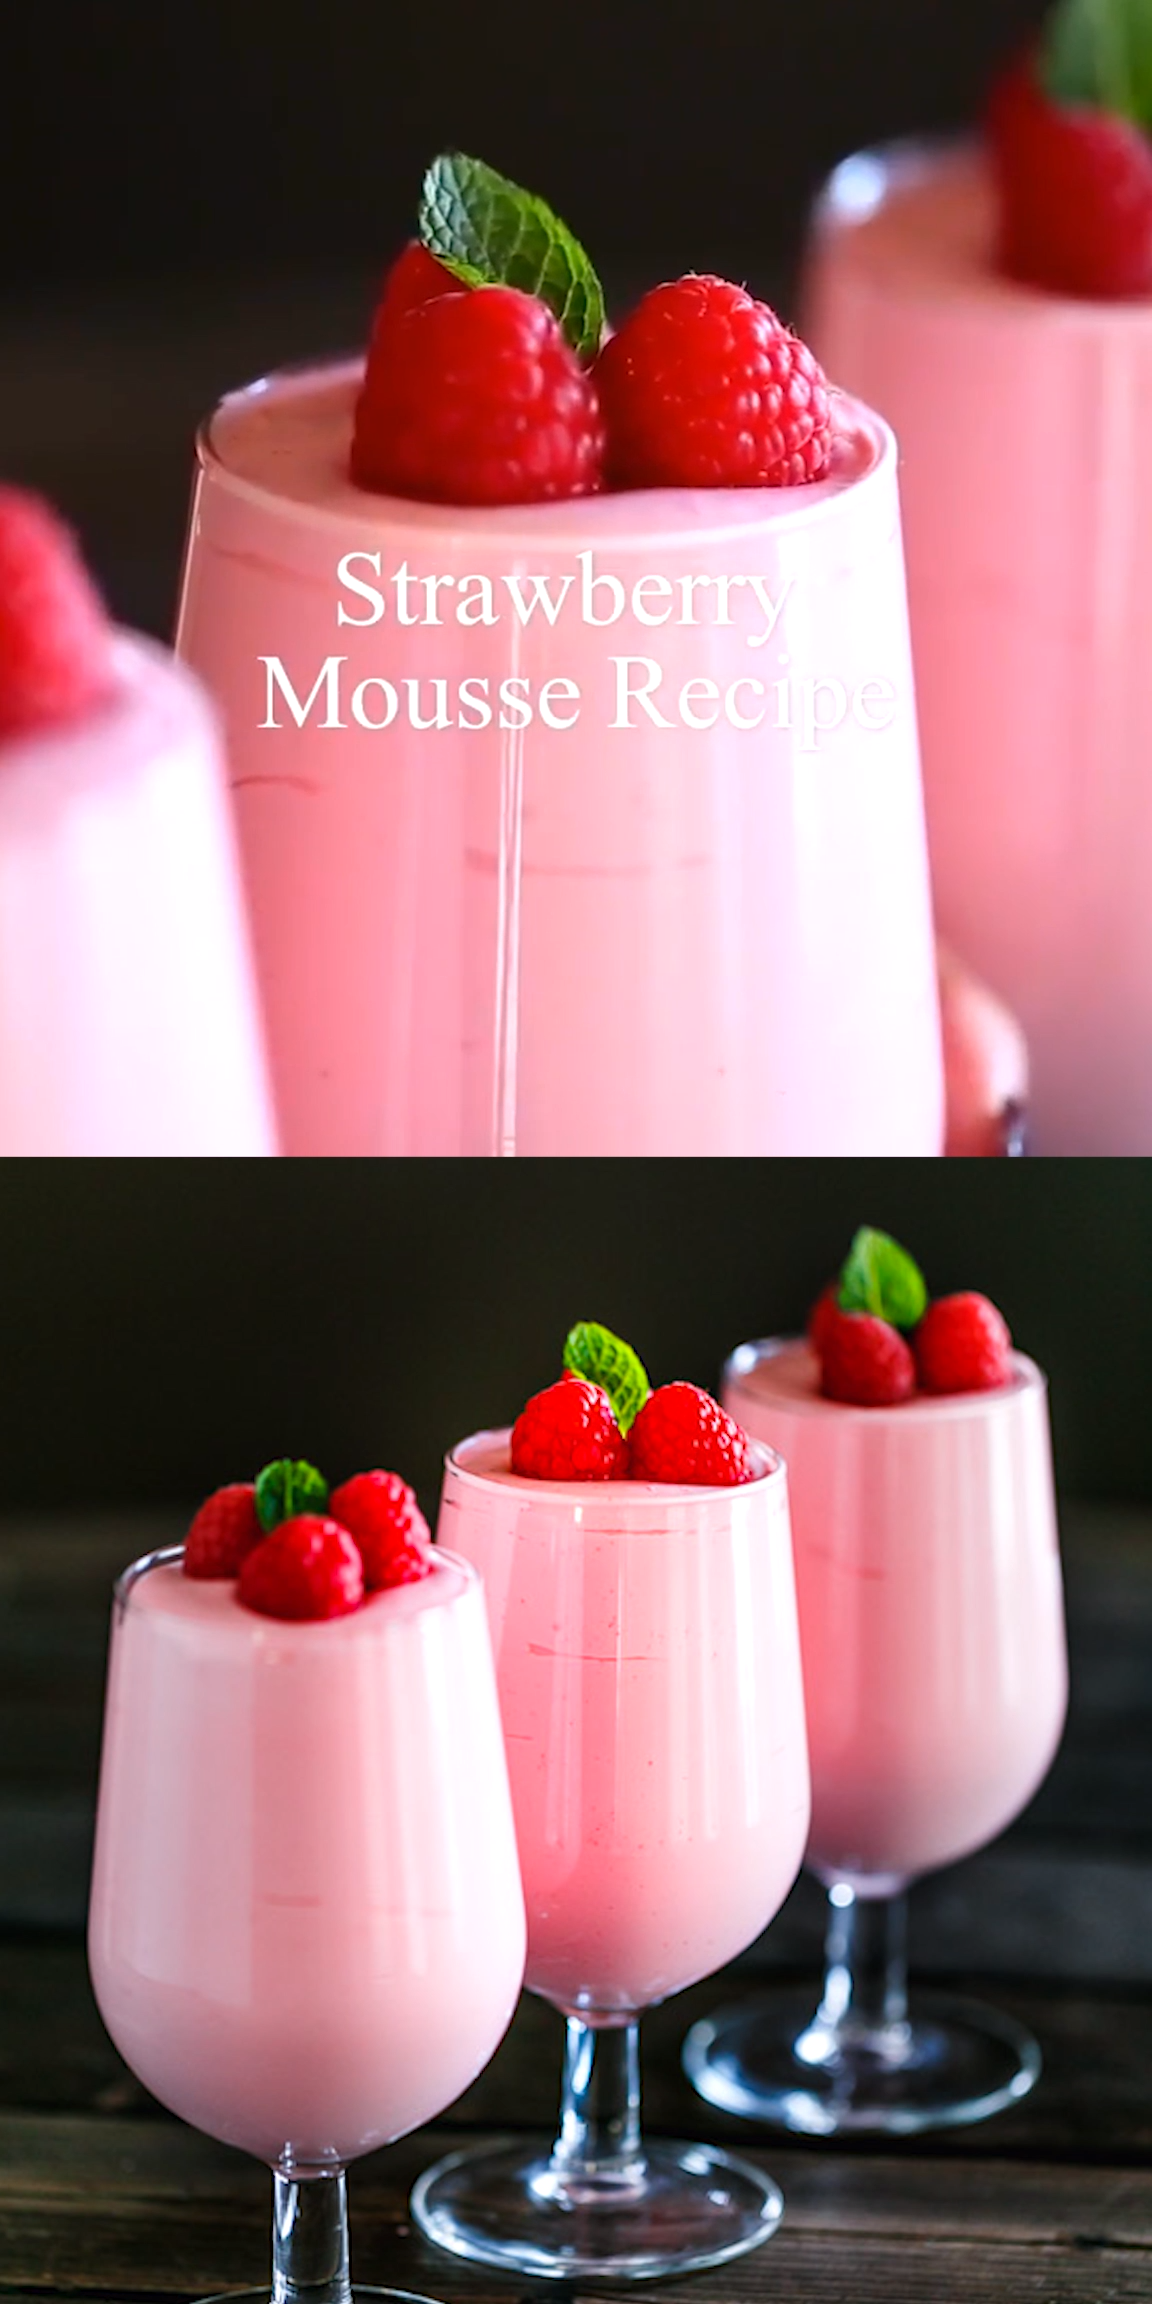 5-Ingredient No-Bake Strawberry Mousse